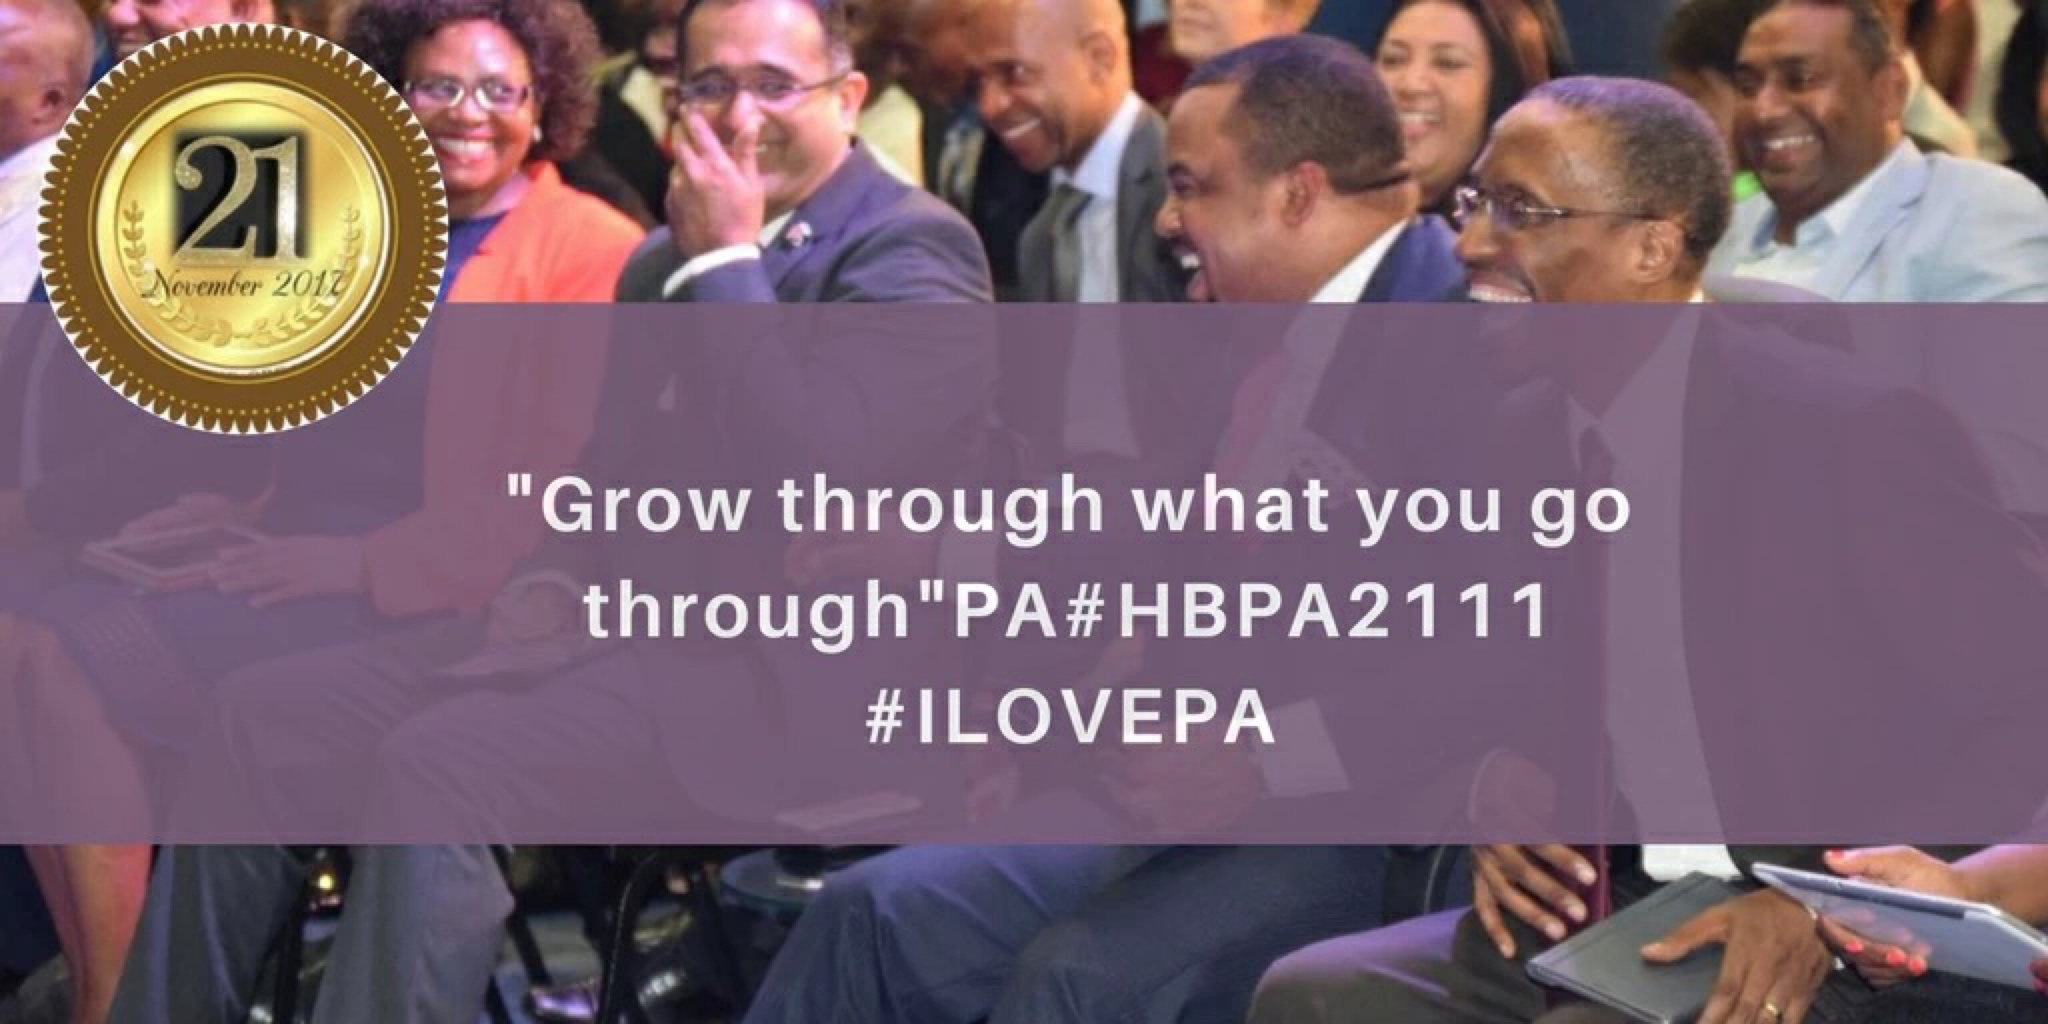 #HBPA2111